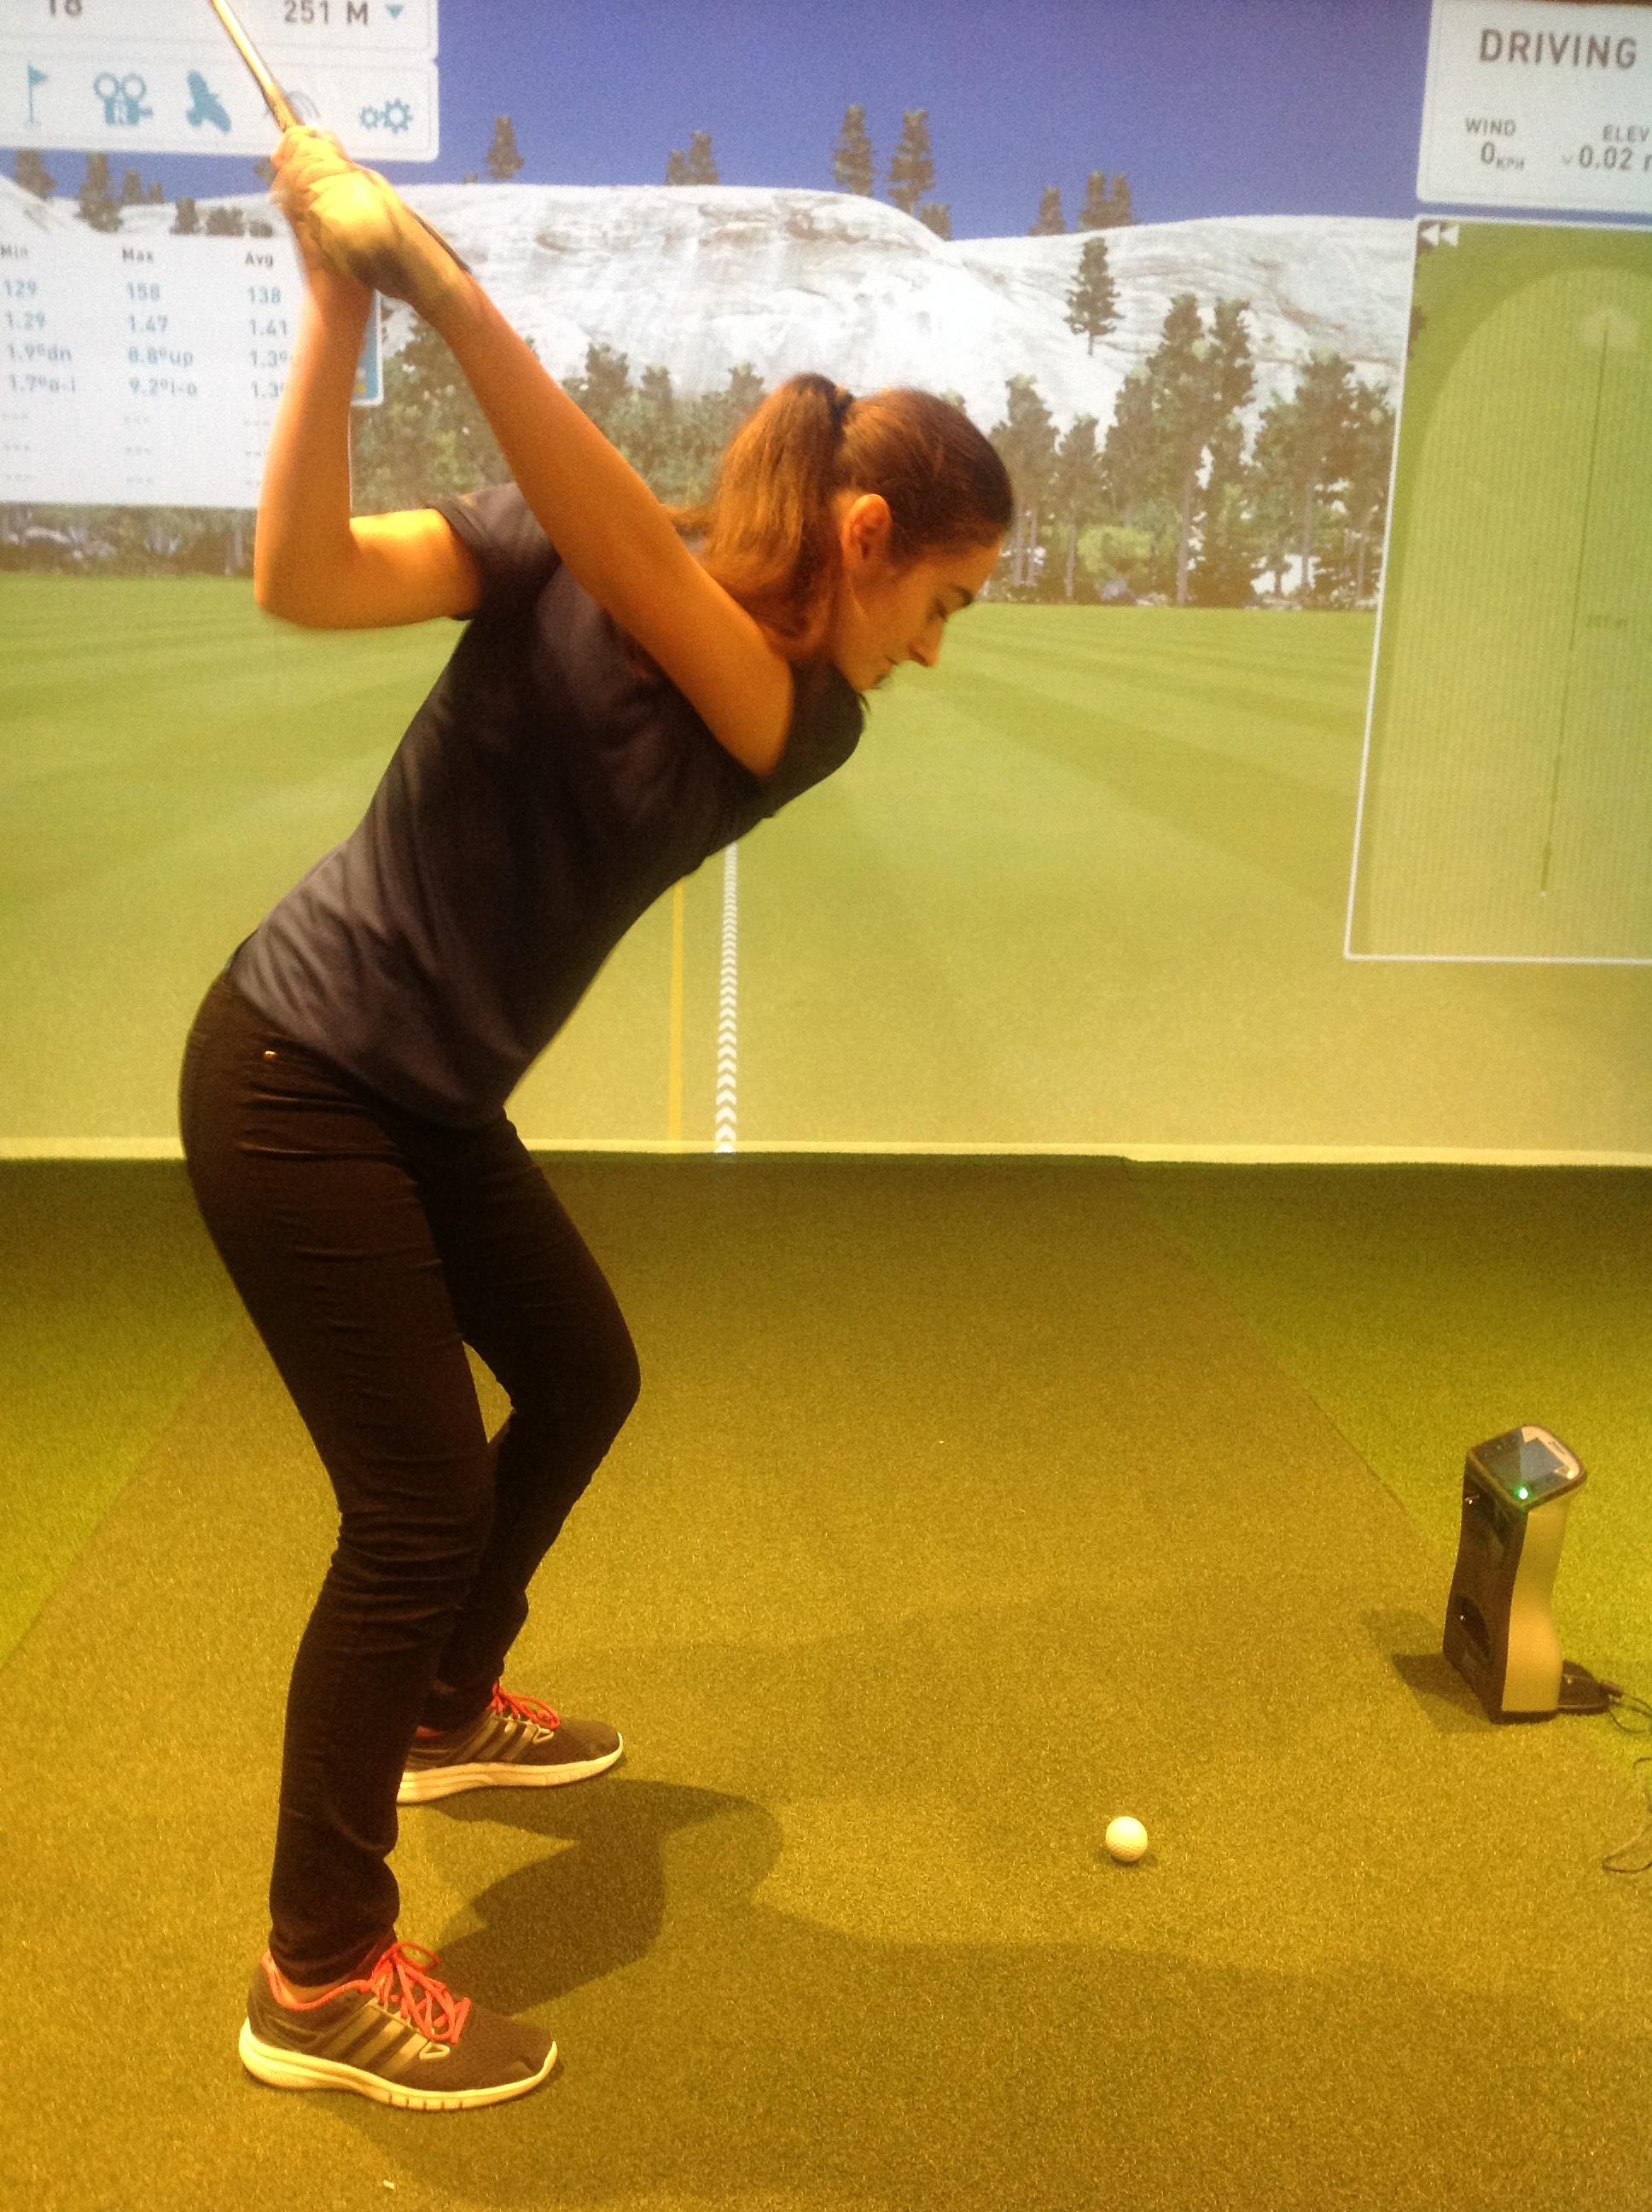 Barbora Šindelářová - Golf Club Austerlitz Extraliga Player. JCGA member.